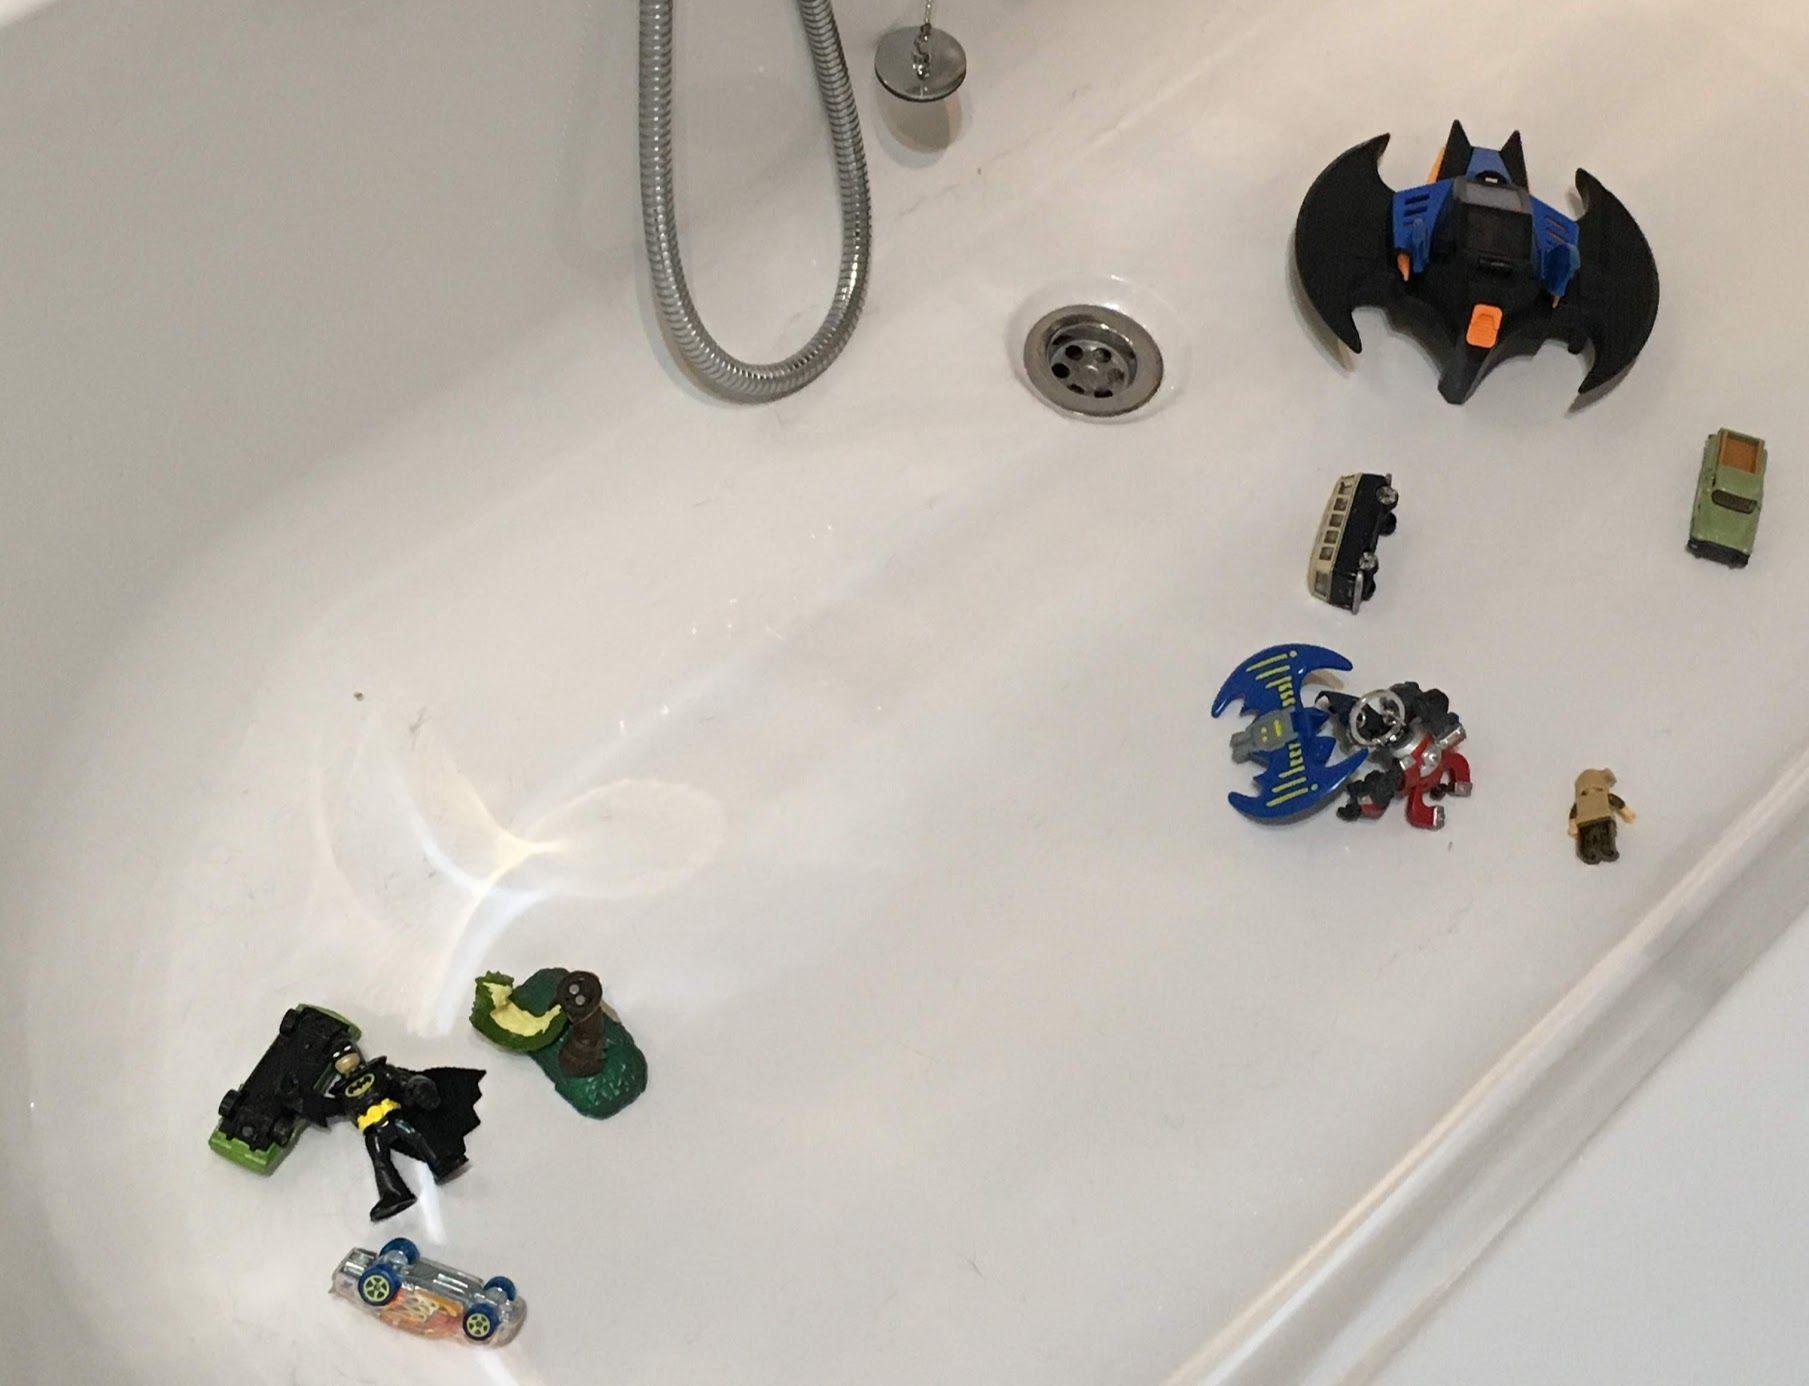 Image may contain: Toy, Bathtub, Tub, Wheel, Machine